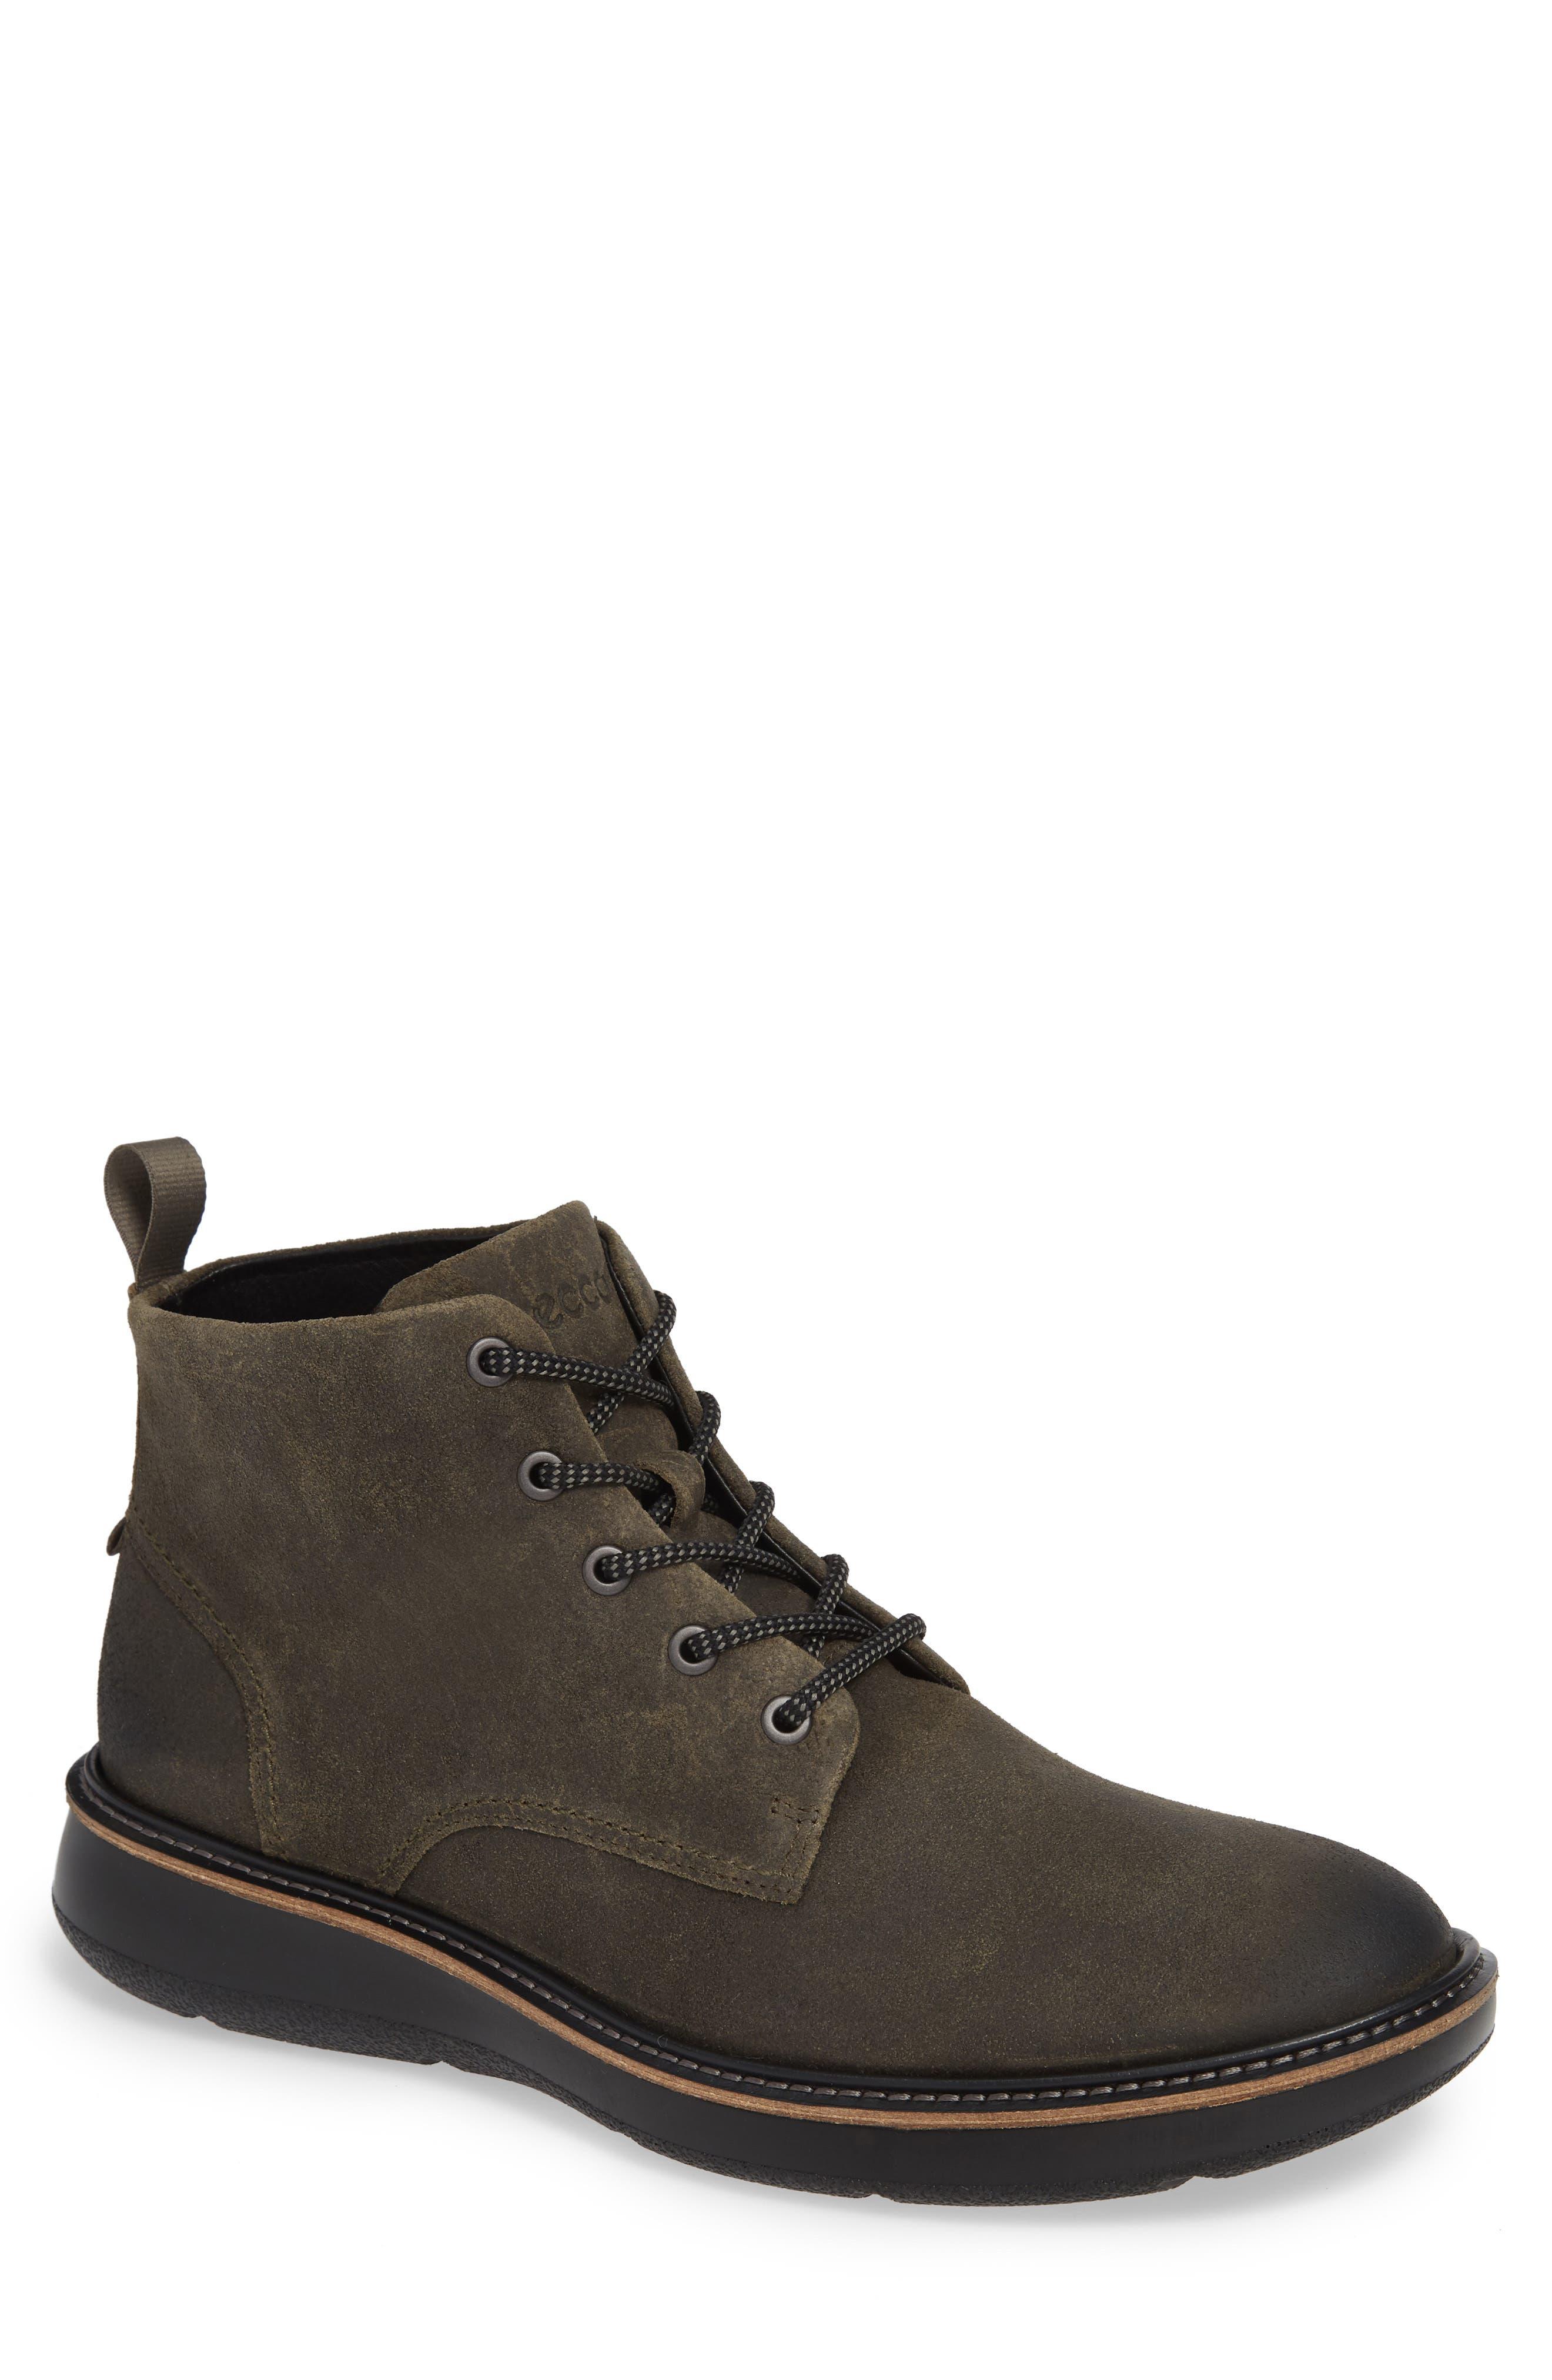 Aurora Plain Toe Boot,                         Main,                         color, TARMAC SUEDE